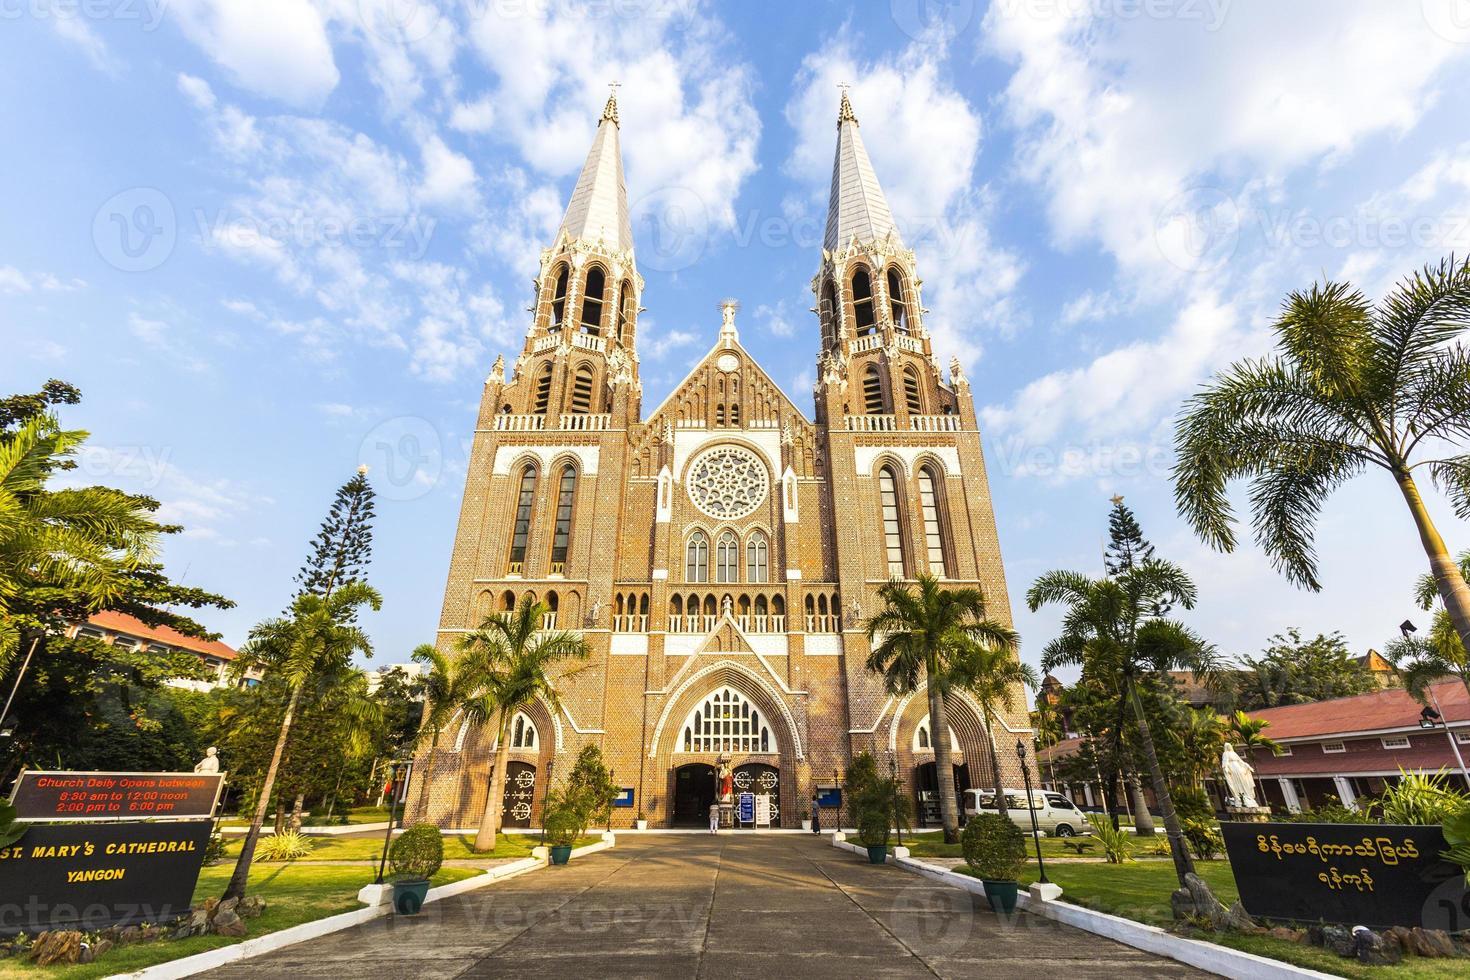 cathédrale saint mary. yangon. myanmar. photo